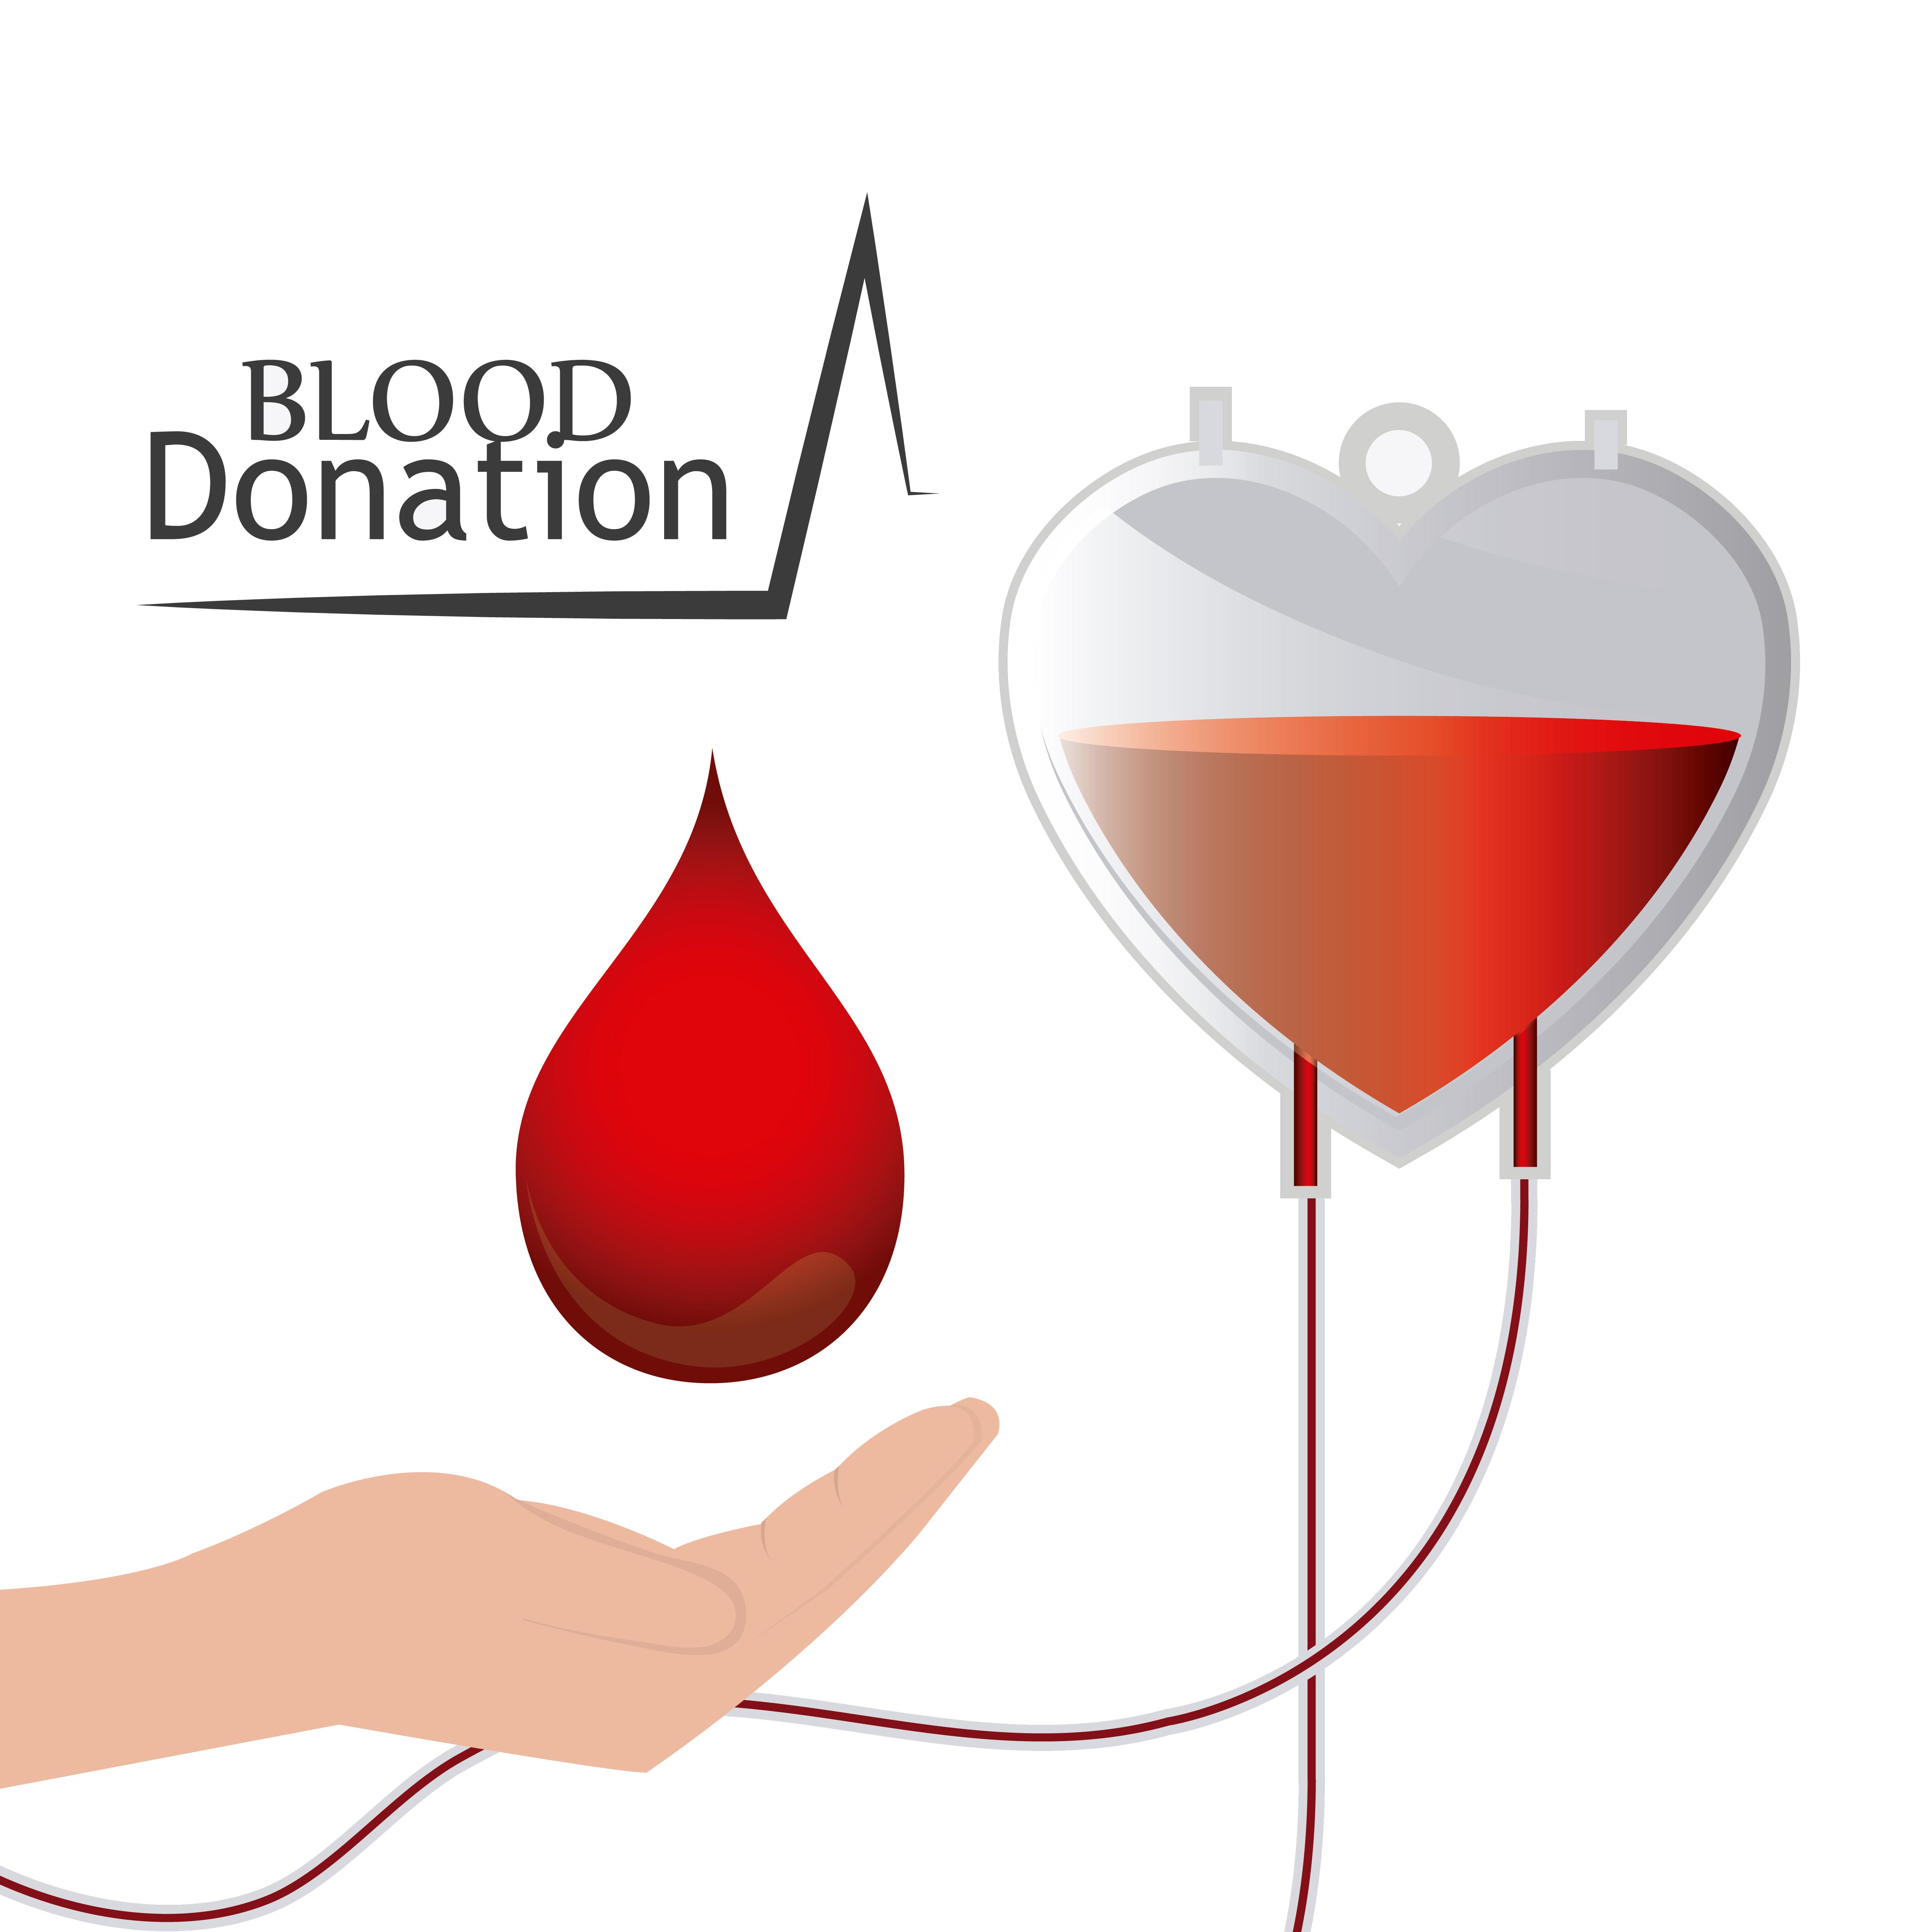 Blood Donation PNG Images Transparent Free Download.